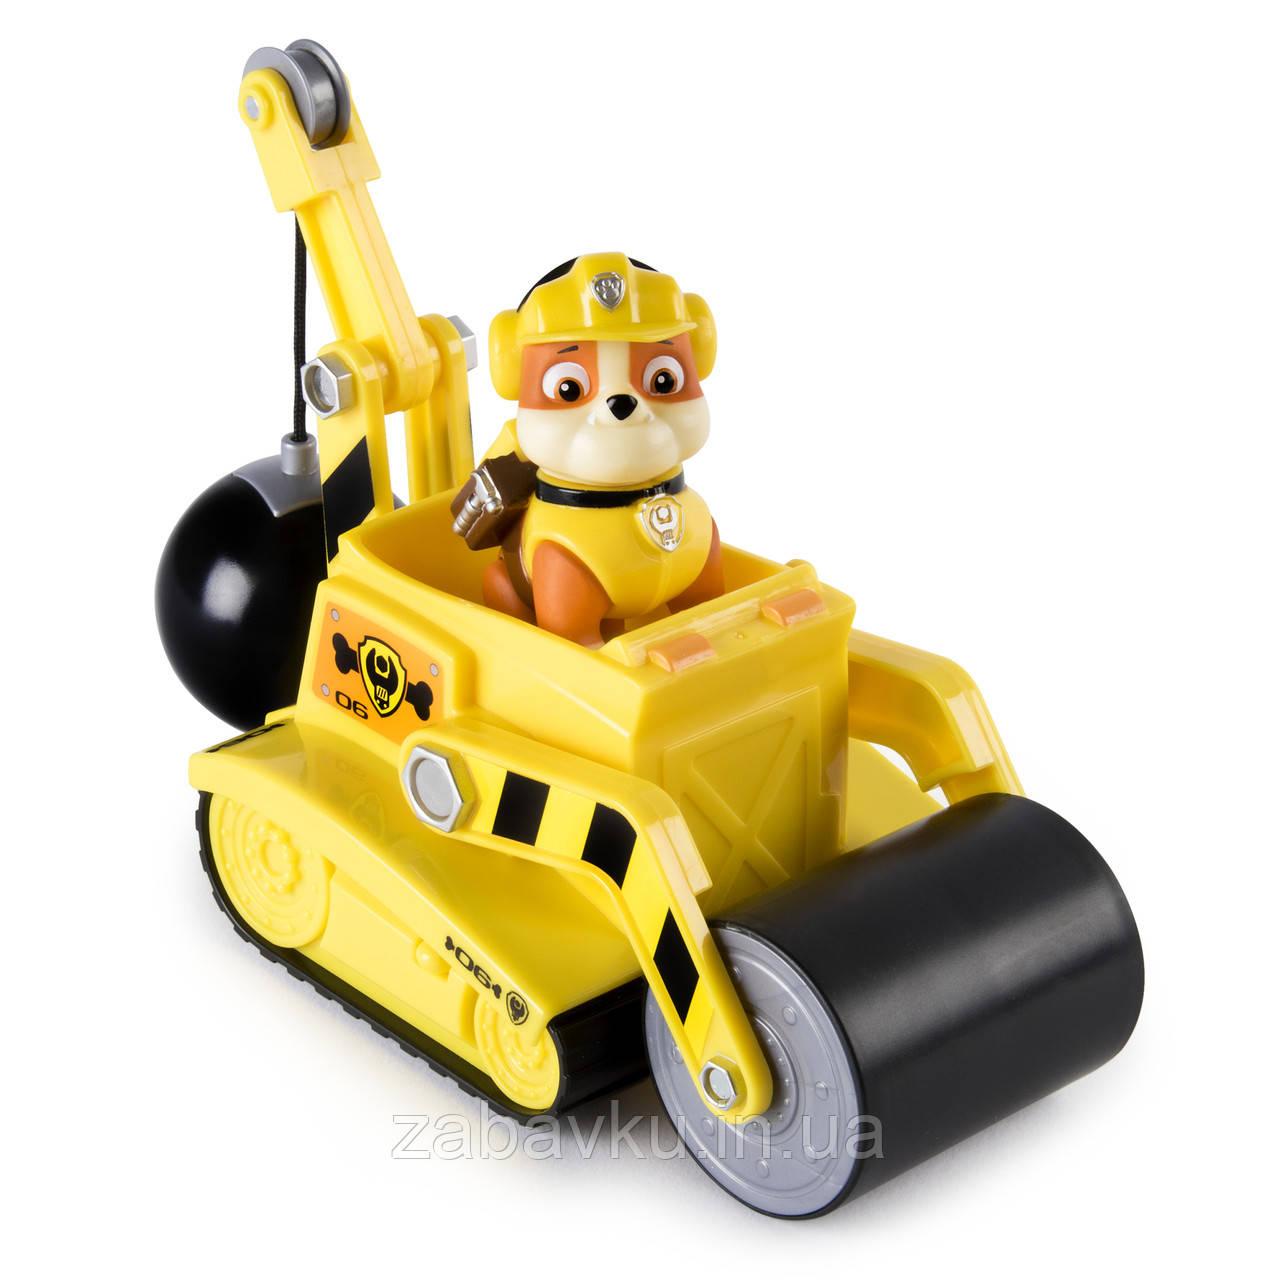 Щенячий Патруль Крєпиш Paw Patrol Rubble´s Steam Roller Construction V